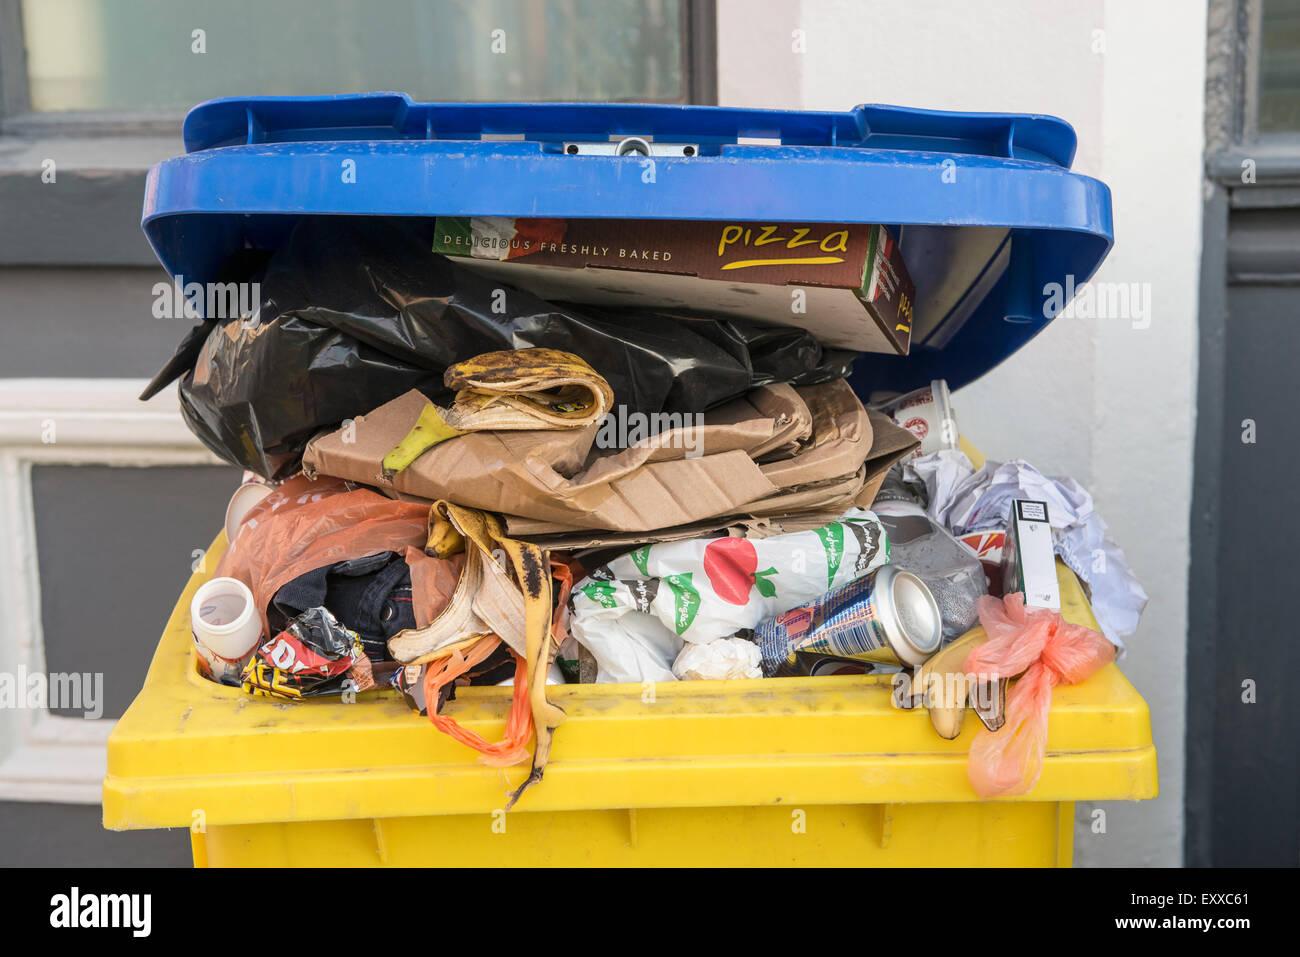 Wheelie bin full of trash / rubbish, Europe - Stock Image